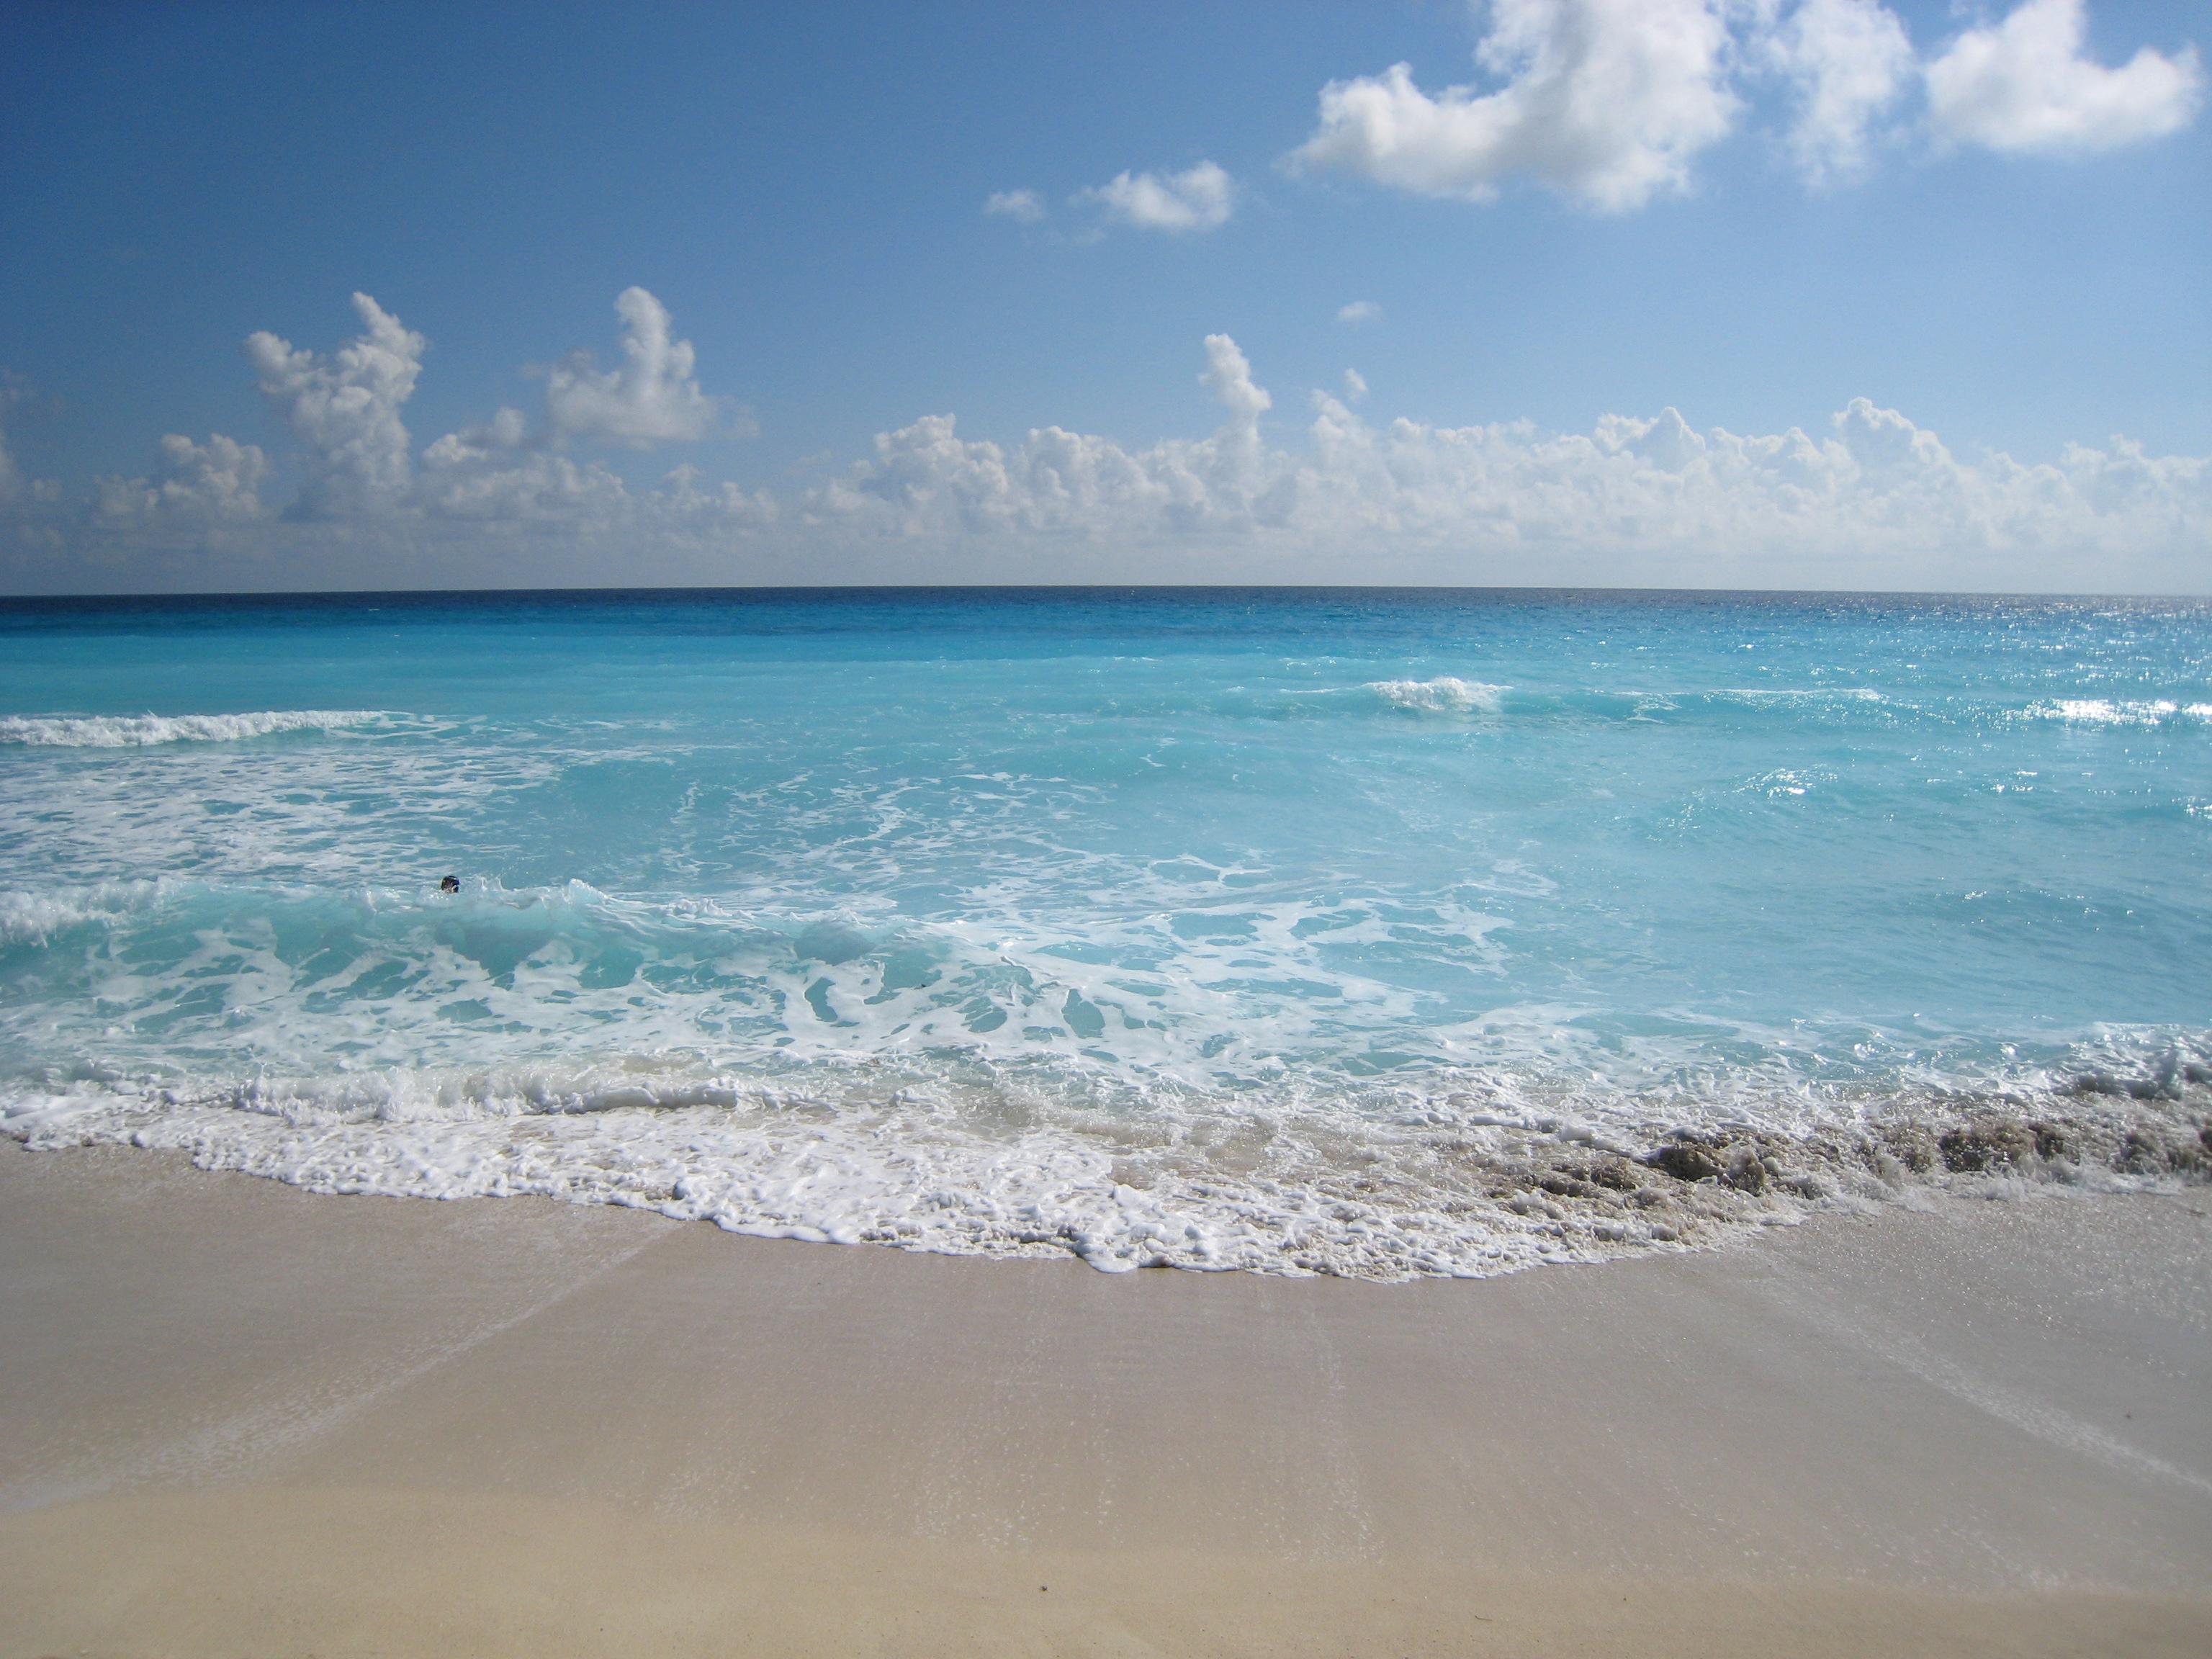 Snorkeling From Beach Beachcomb Island Fiji